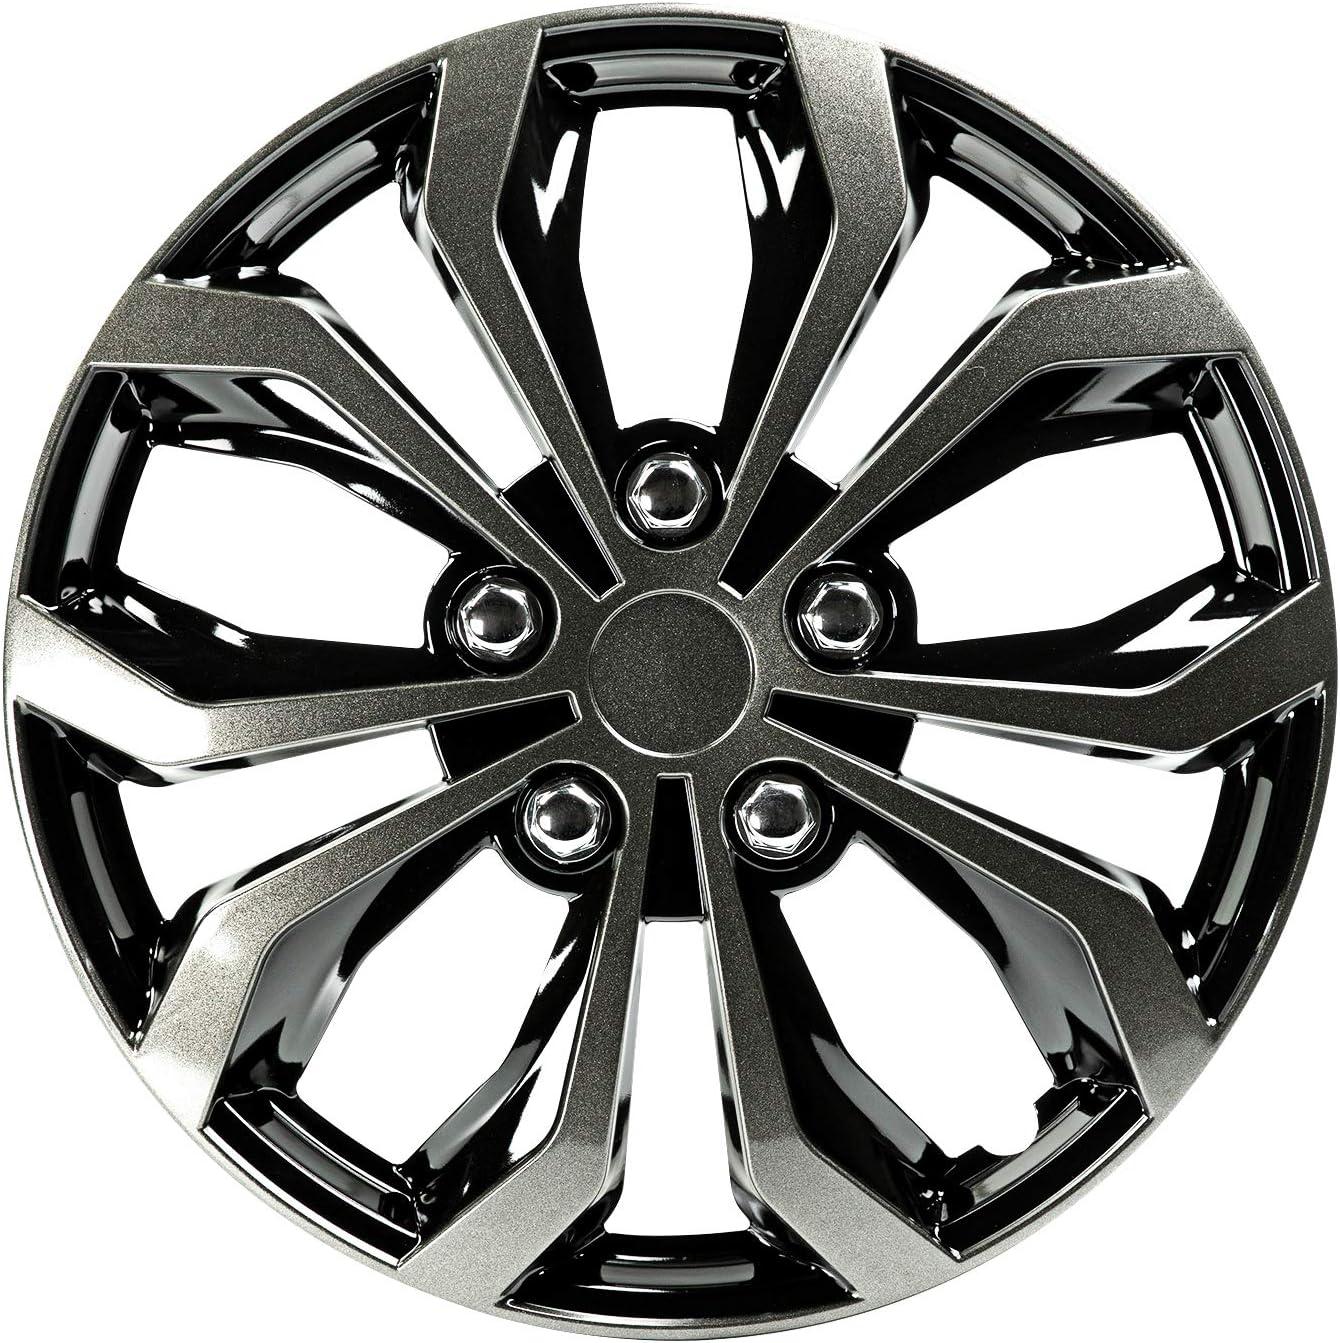 Ranking TOP14 PILOT Spyder Performance Wheel Attention brand Cover Black Gun WH138-17GB Metal